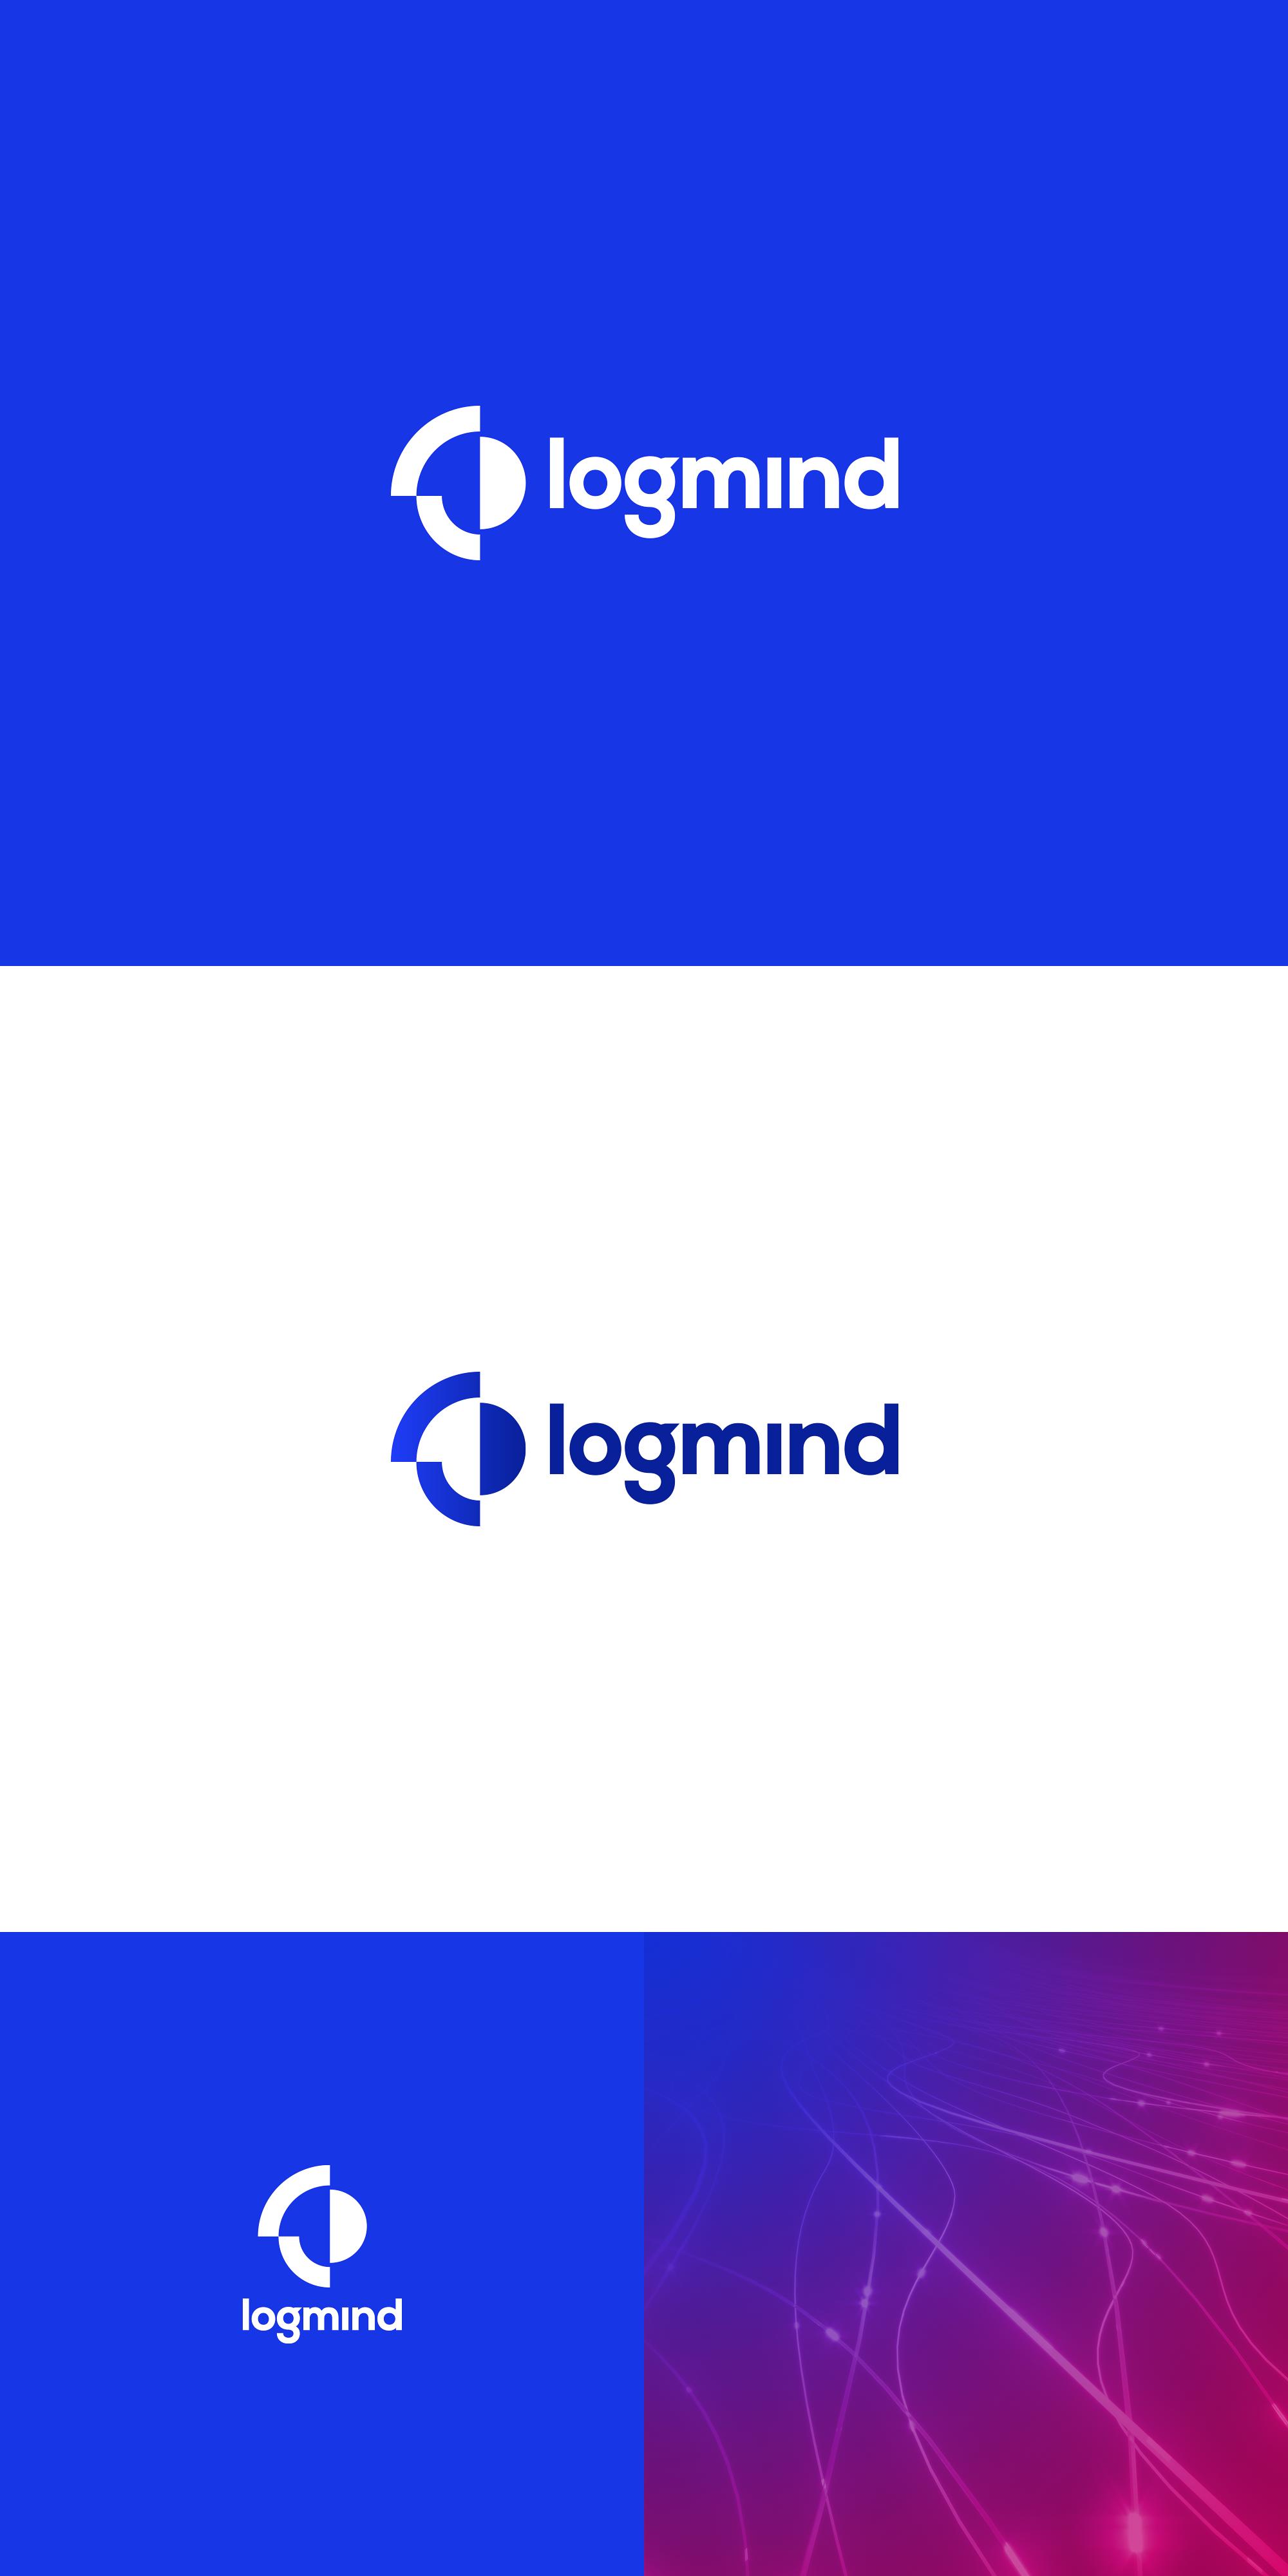 Logmind logo